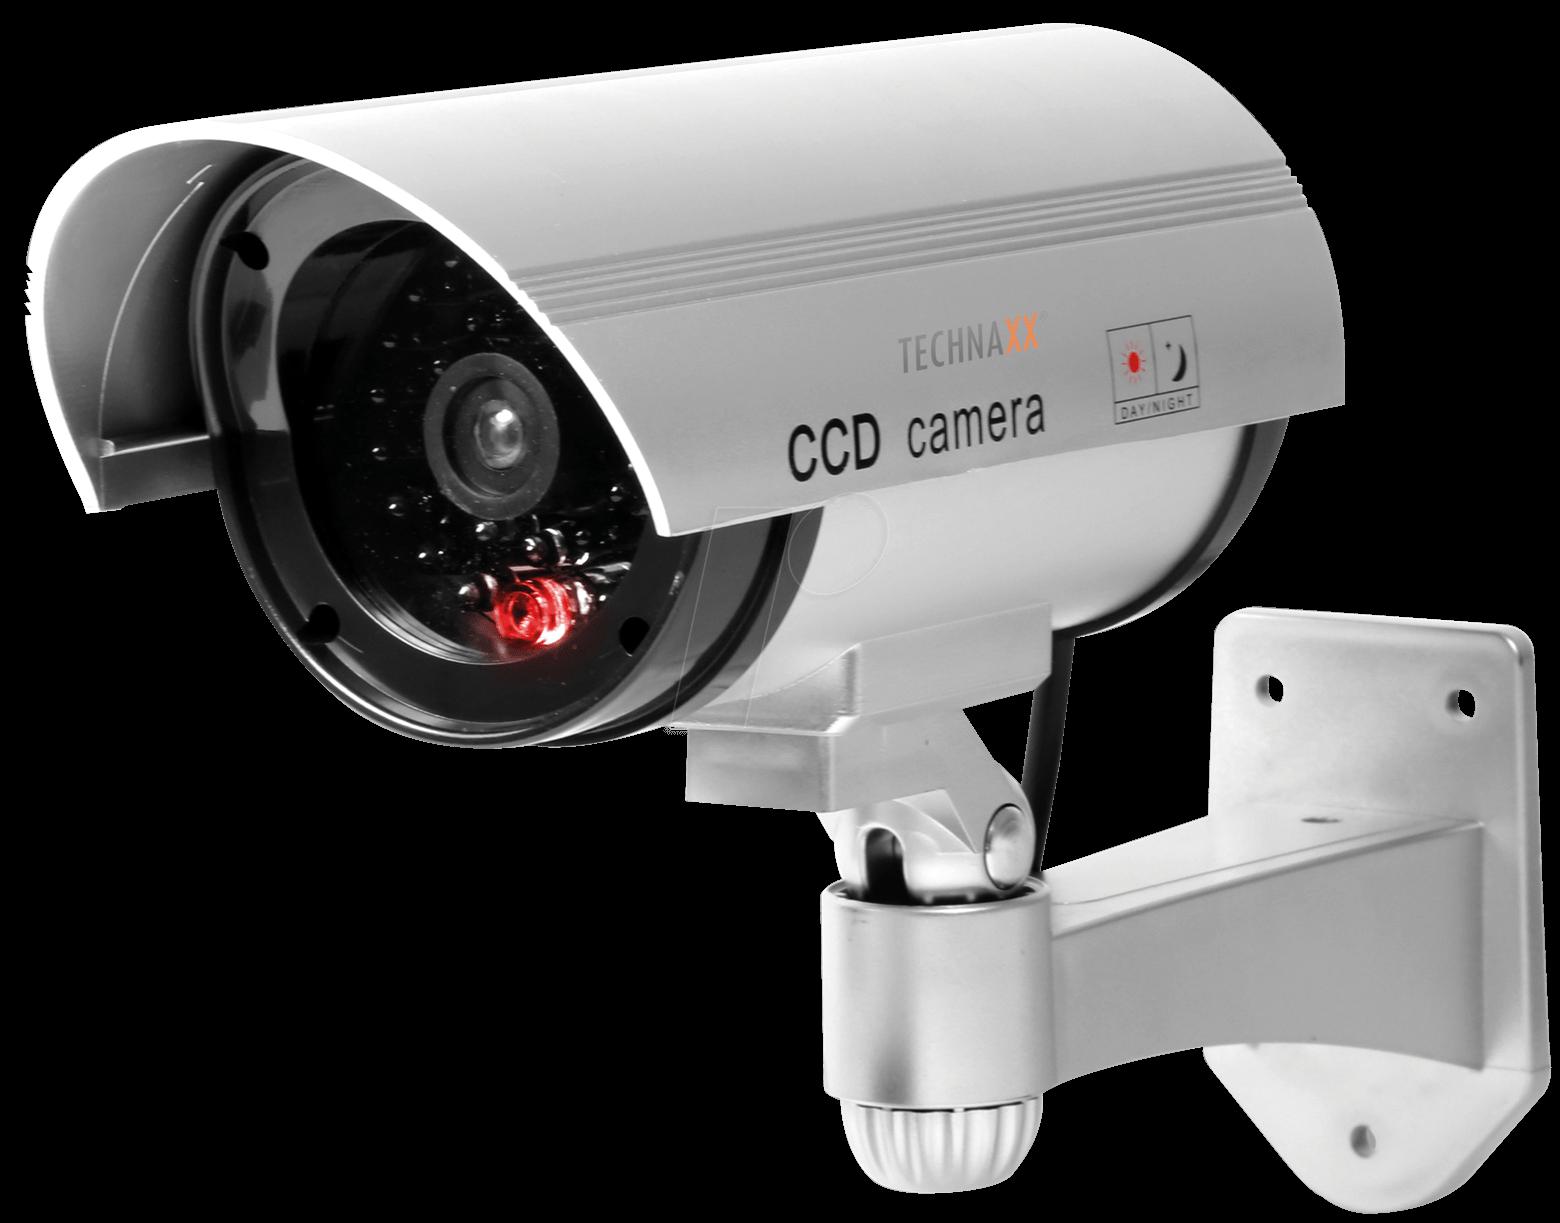 Technaxx 4310 ccd berwachungskamera attrappe tx 18 bei reichelt elektronik - Camera de surveillance factice ...